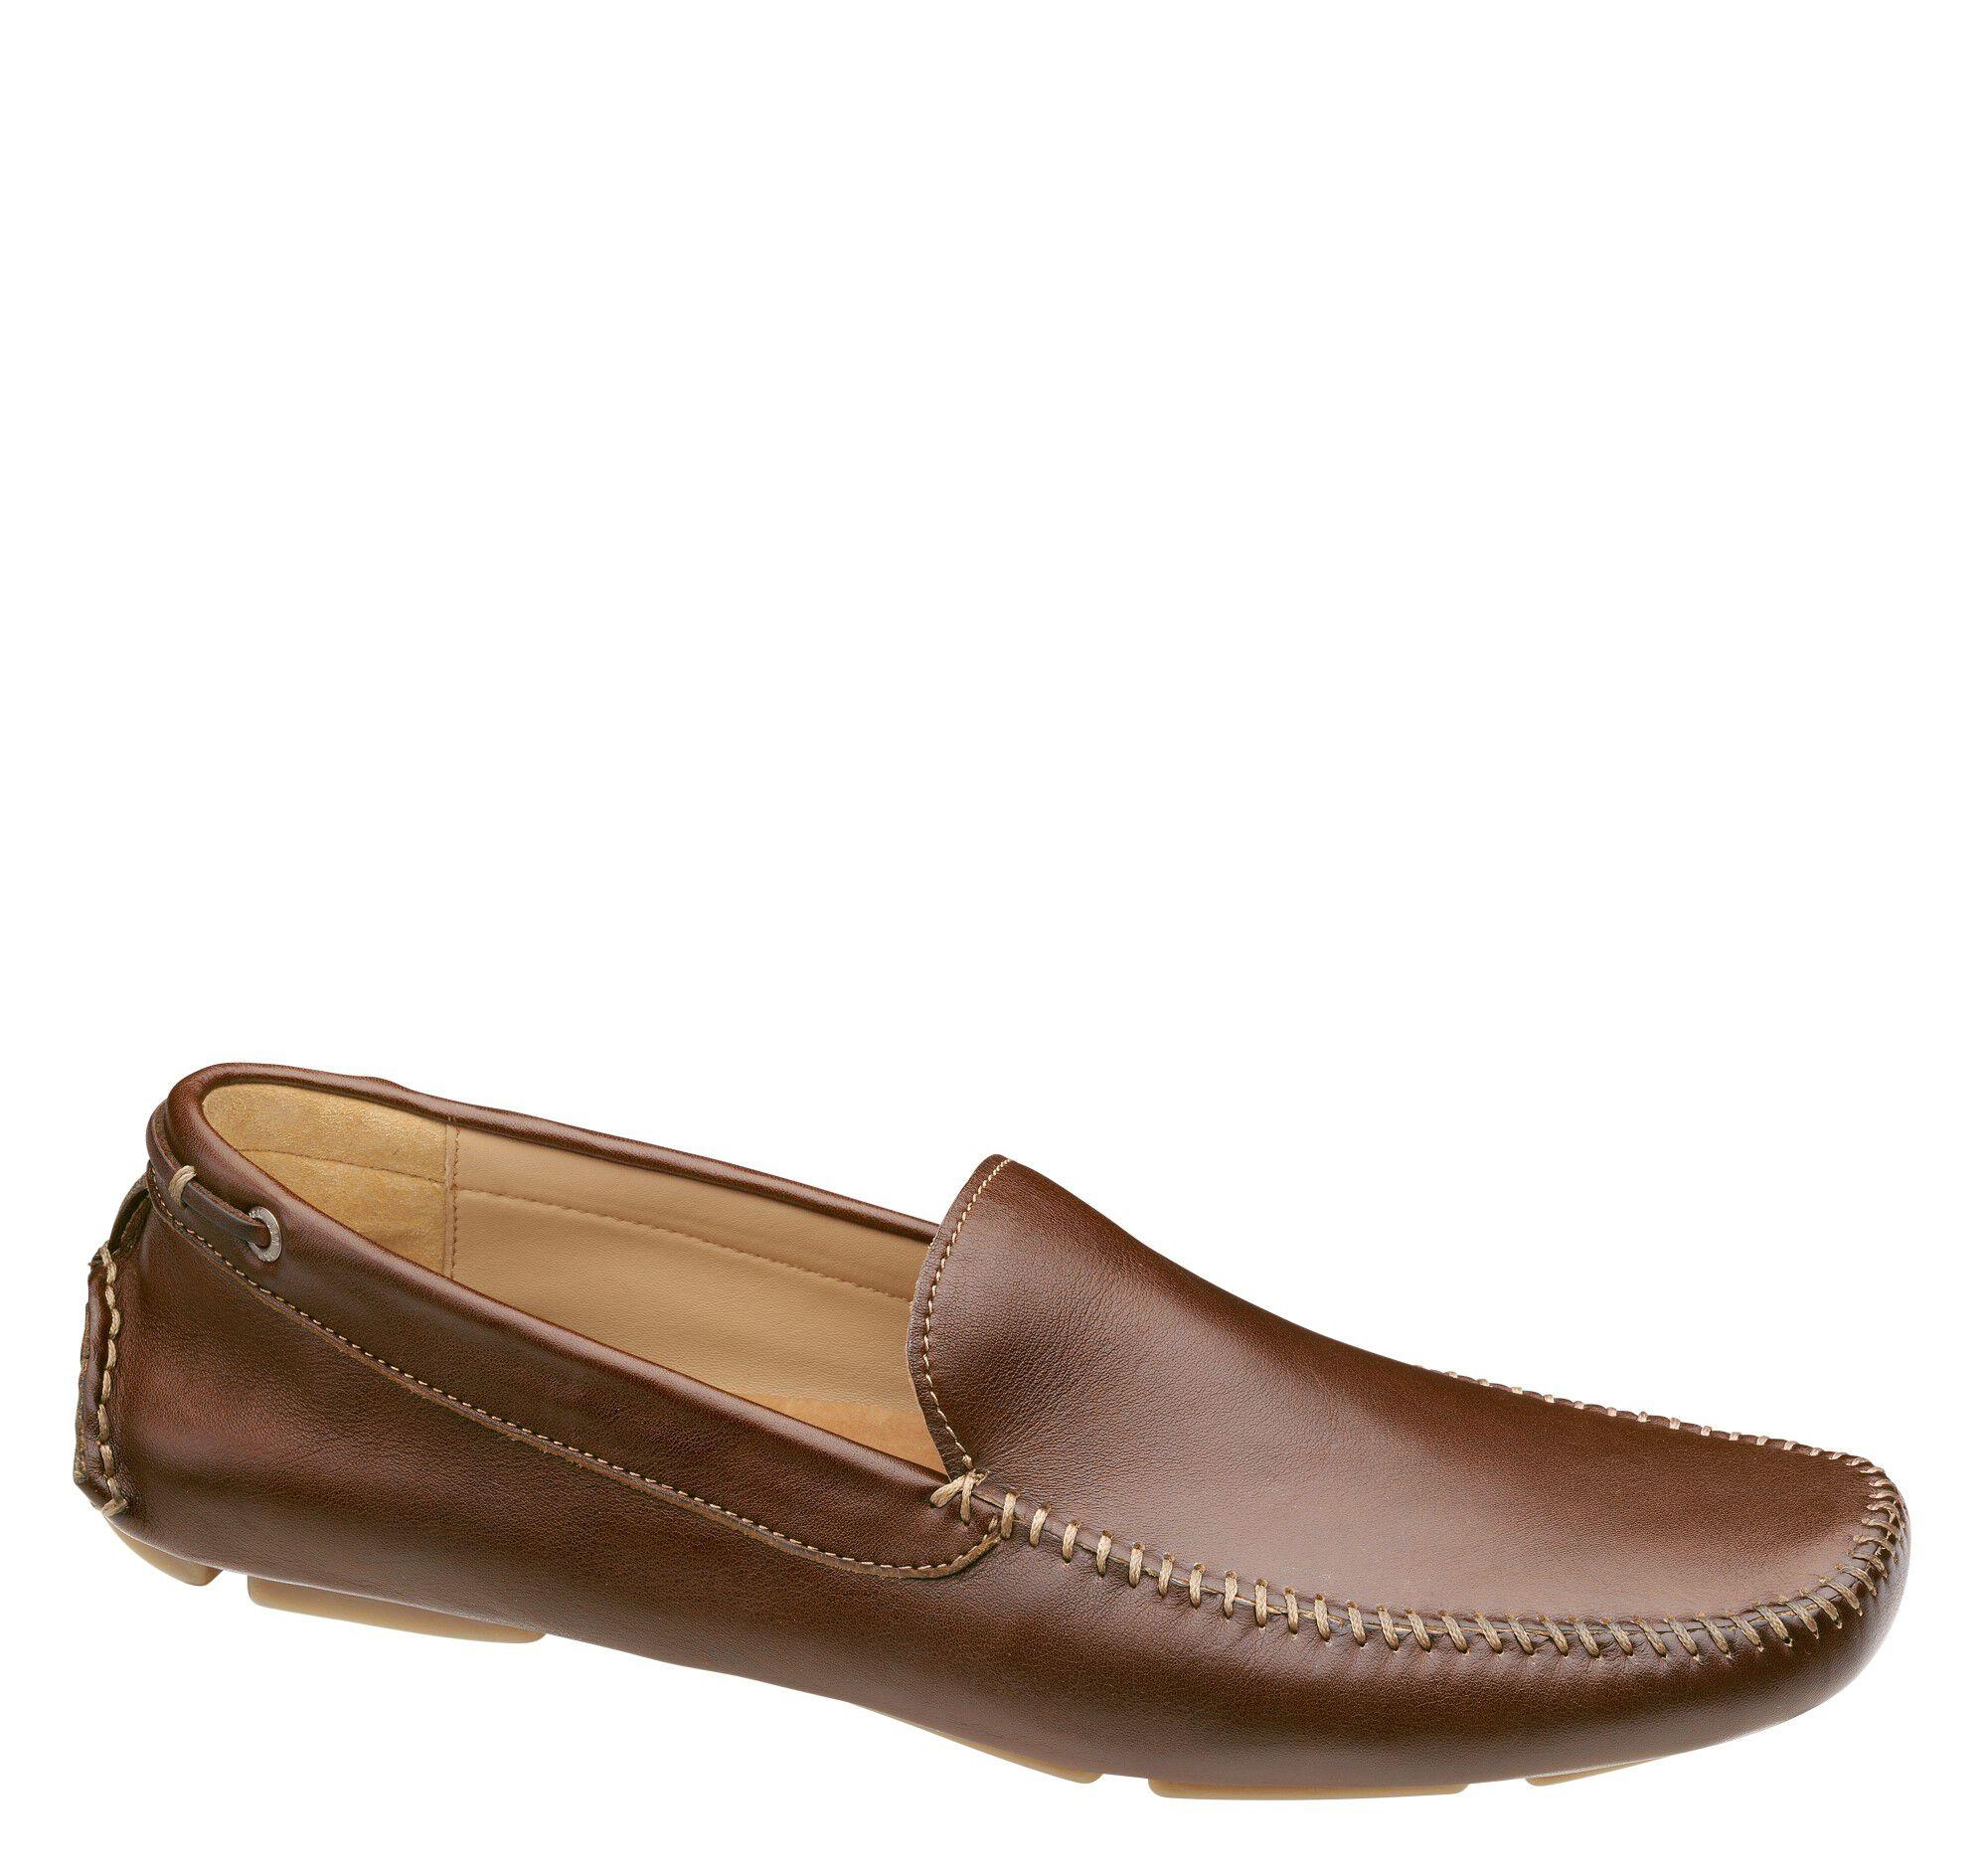 Mckinnon Venetian Johnston Murphy D Island Shoes Slip On Mocasine Casual Loafers Black